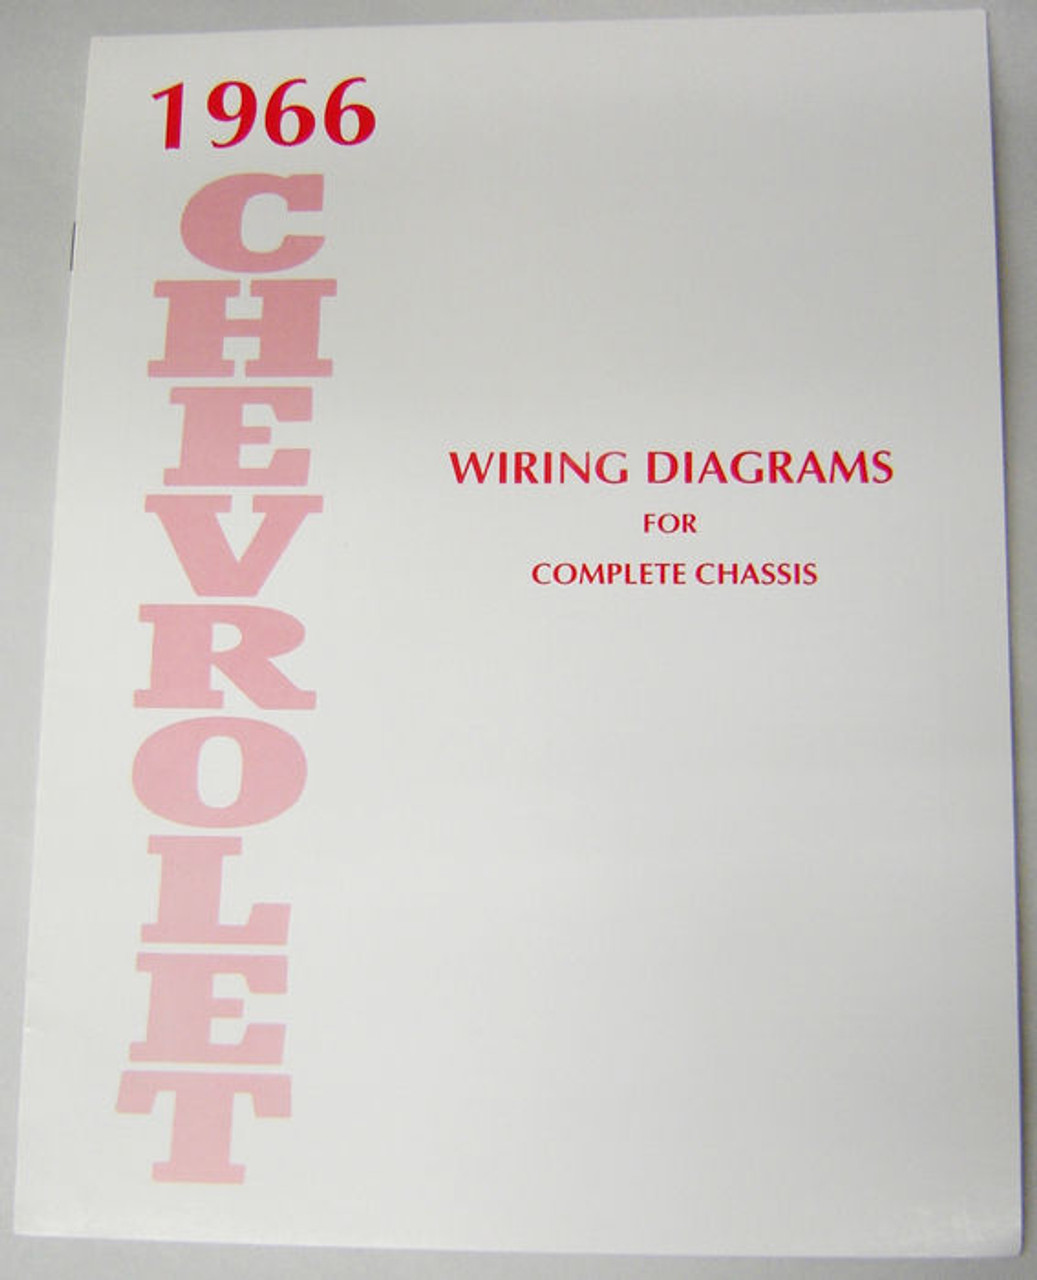 L1022_zpsjouiuker__97070.1443480941?c=2 66 1966 chevy impala electrical wiring diagram manual i 5 1966 chevy impala wiring diagram at edmiracle.co